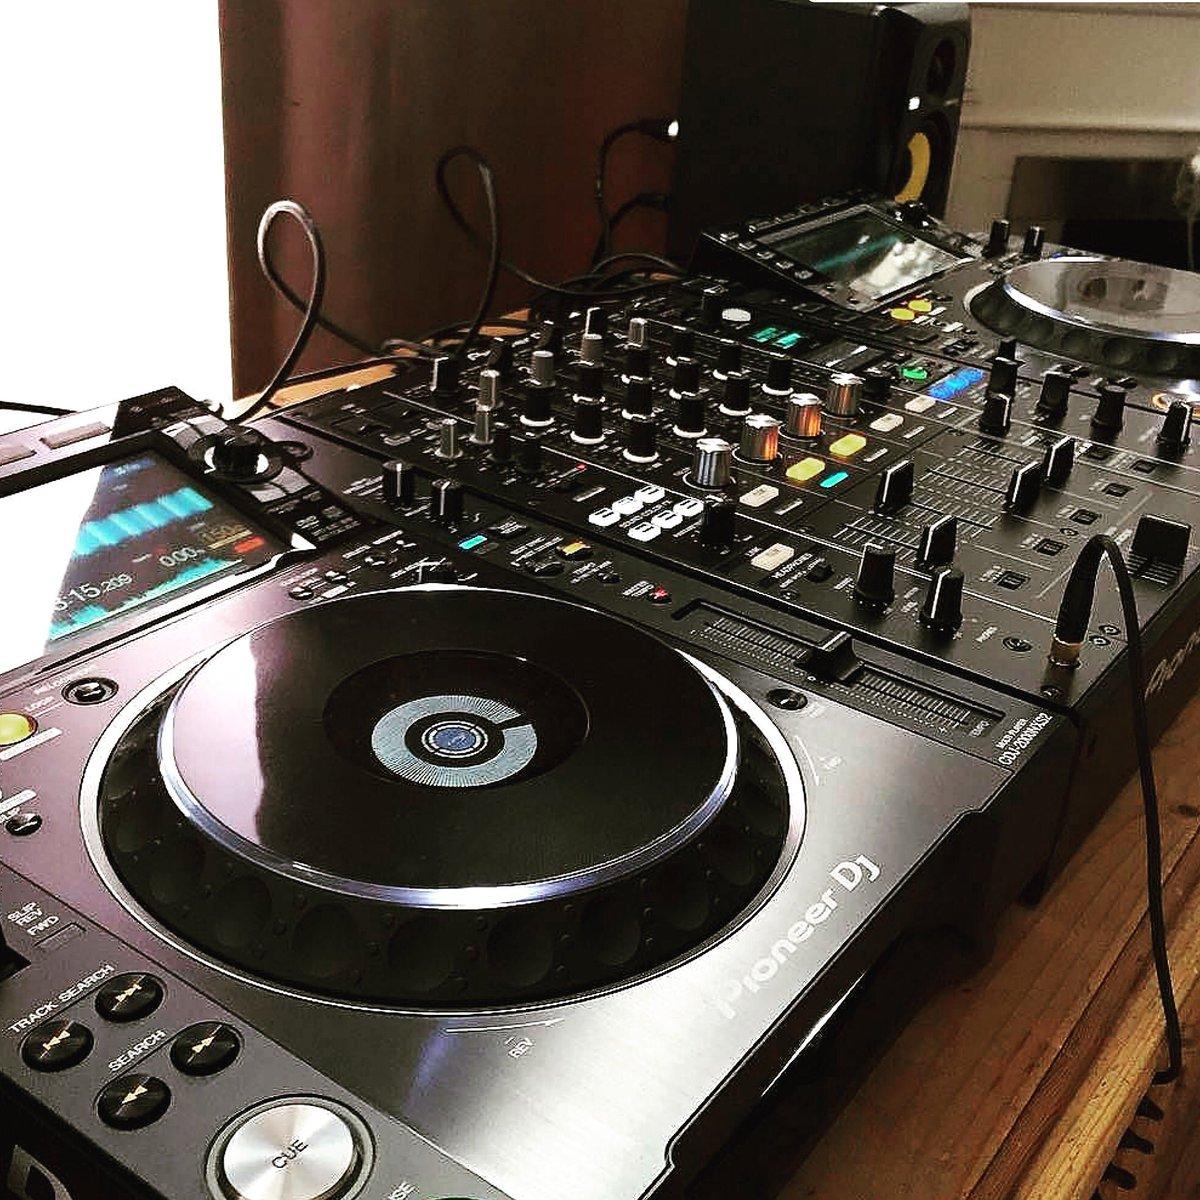 how to dj the ultimate guide to become a dj dj djing dj like pro